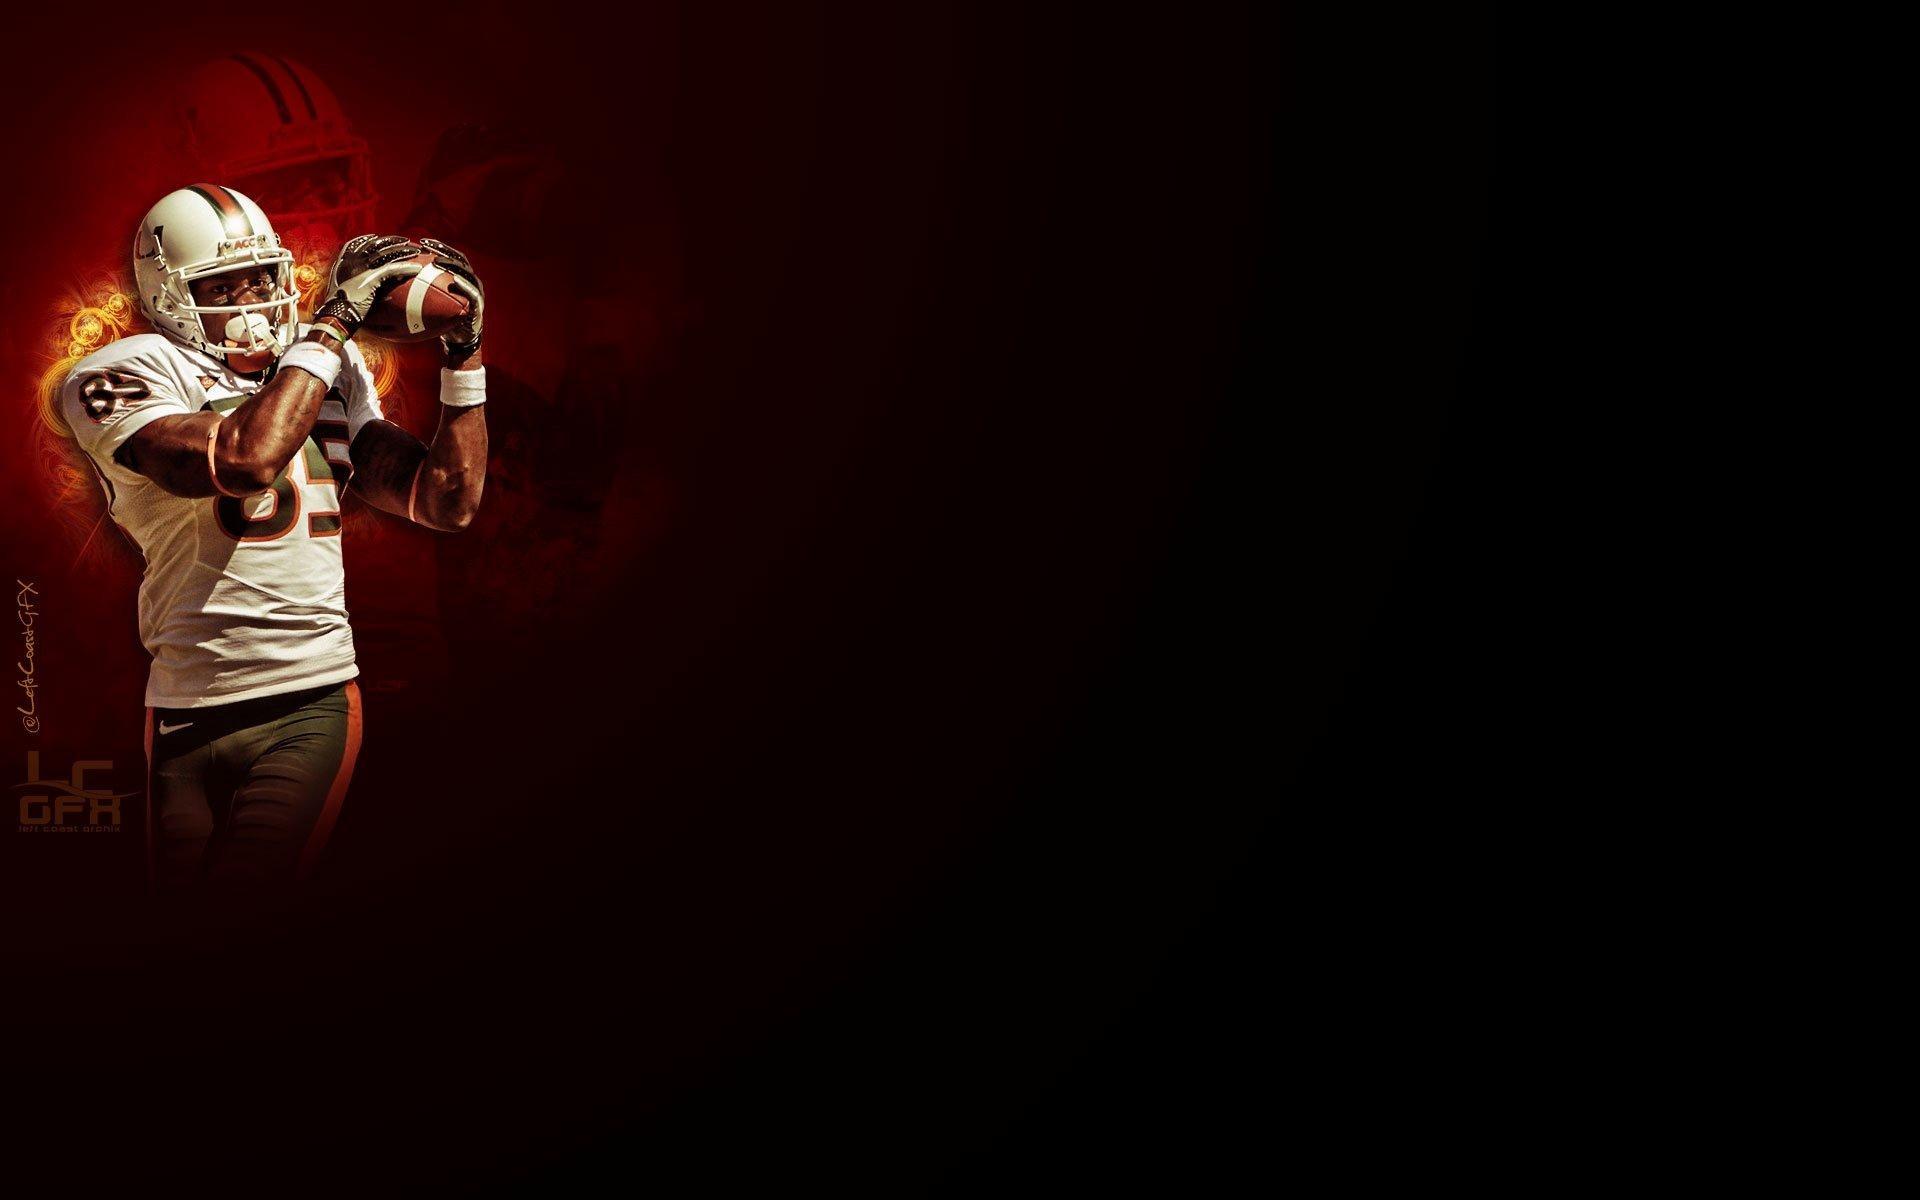 Redskins-wallpaper-photo-photos-hankerson-leonard